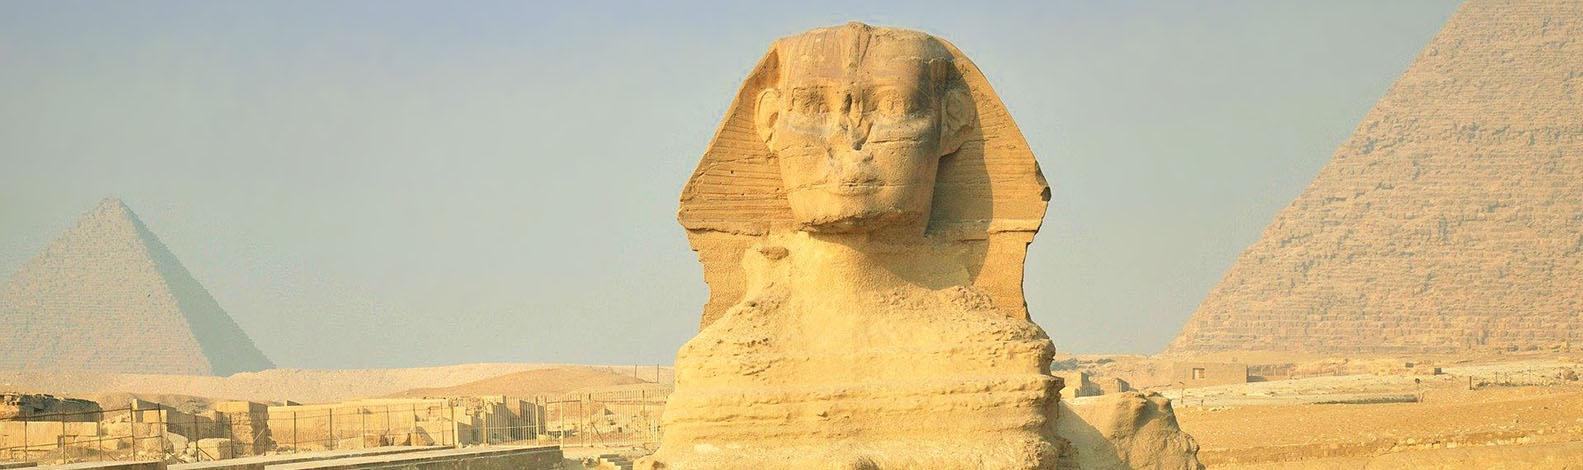 egypt cheap tours cairo 1